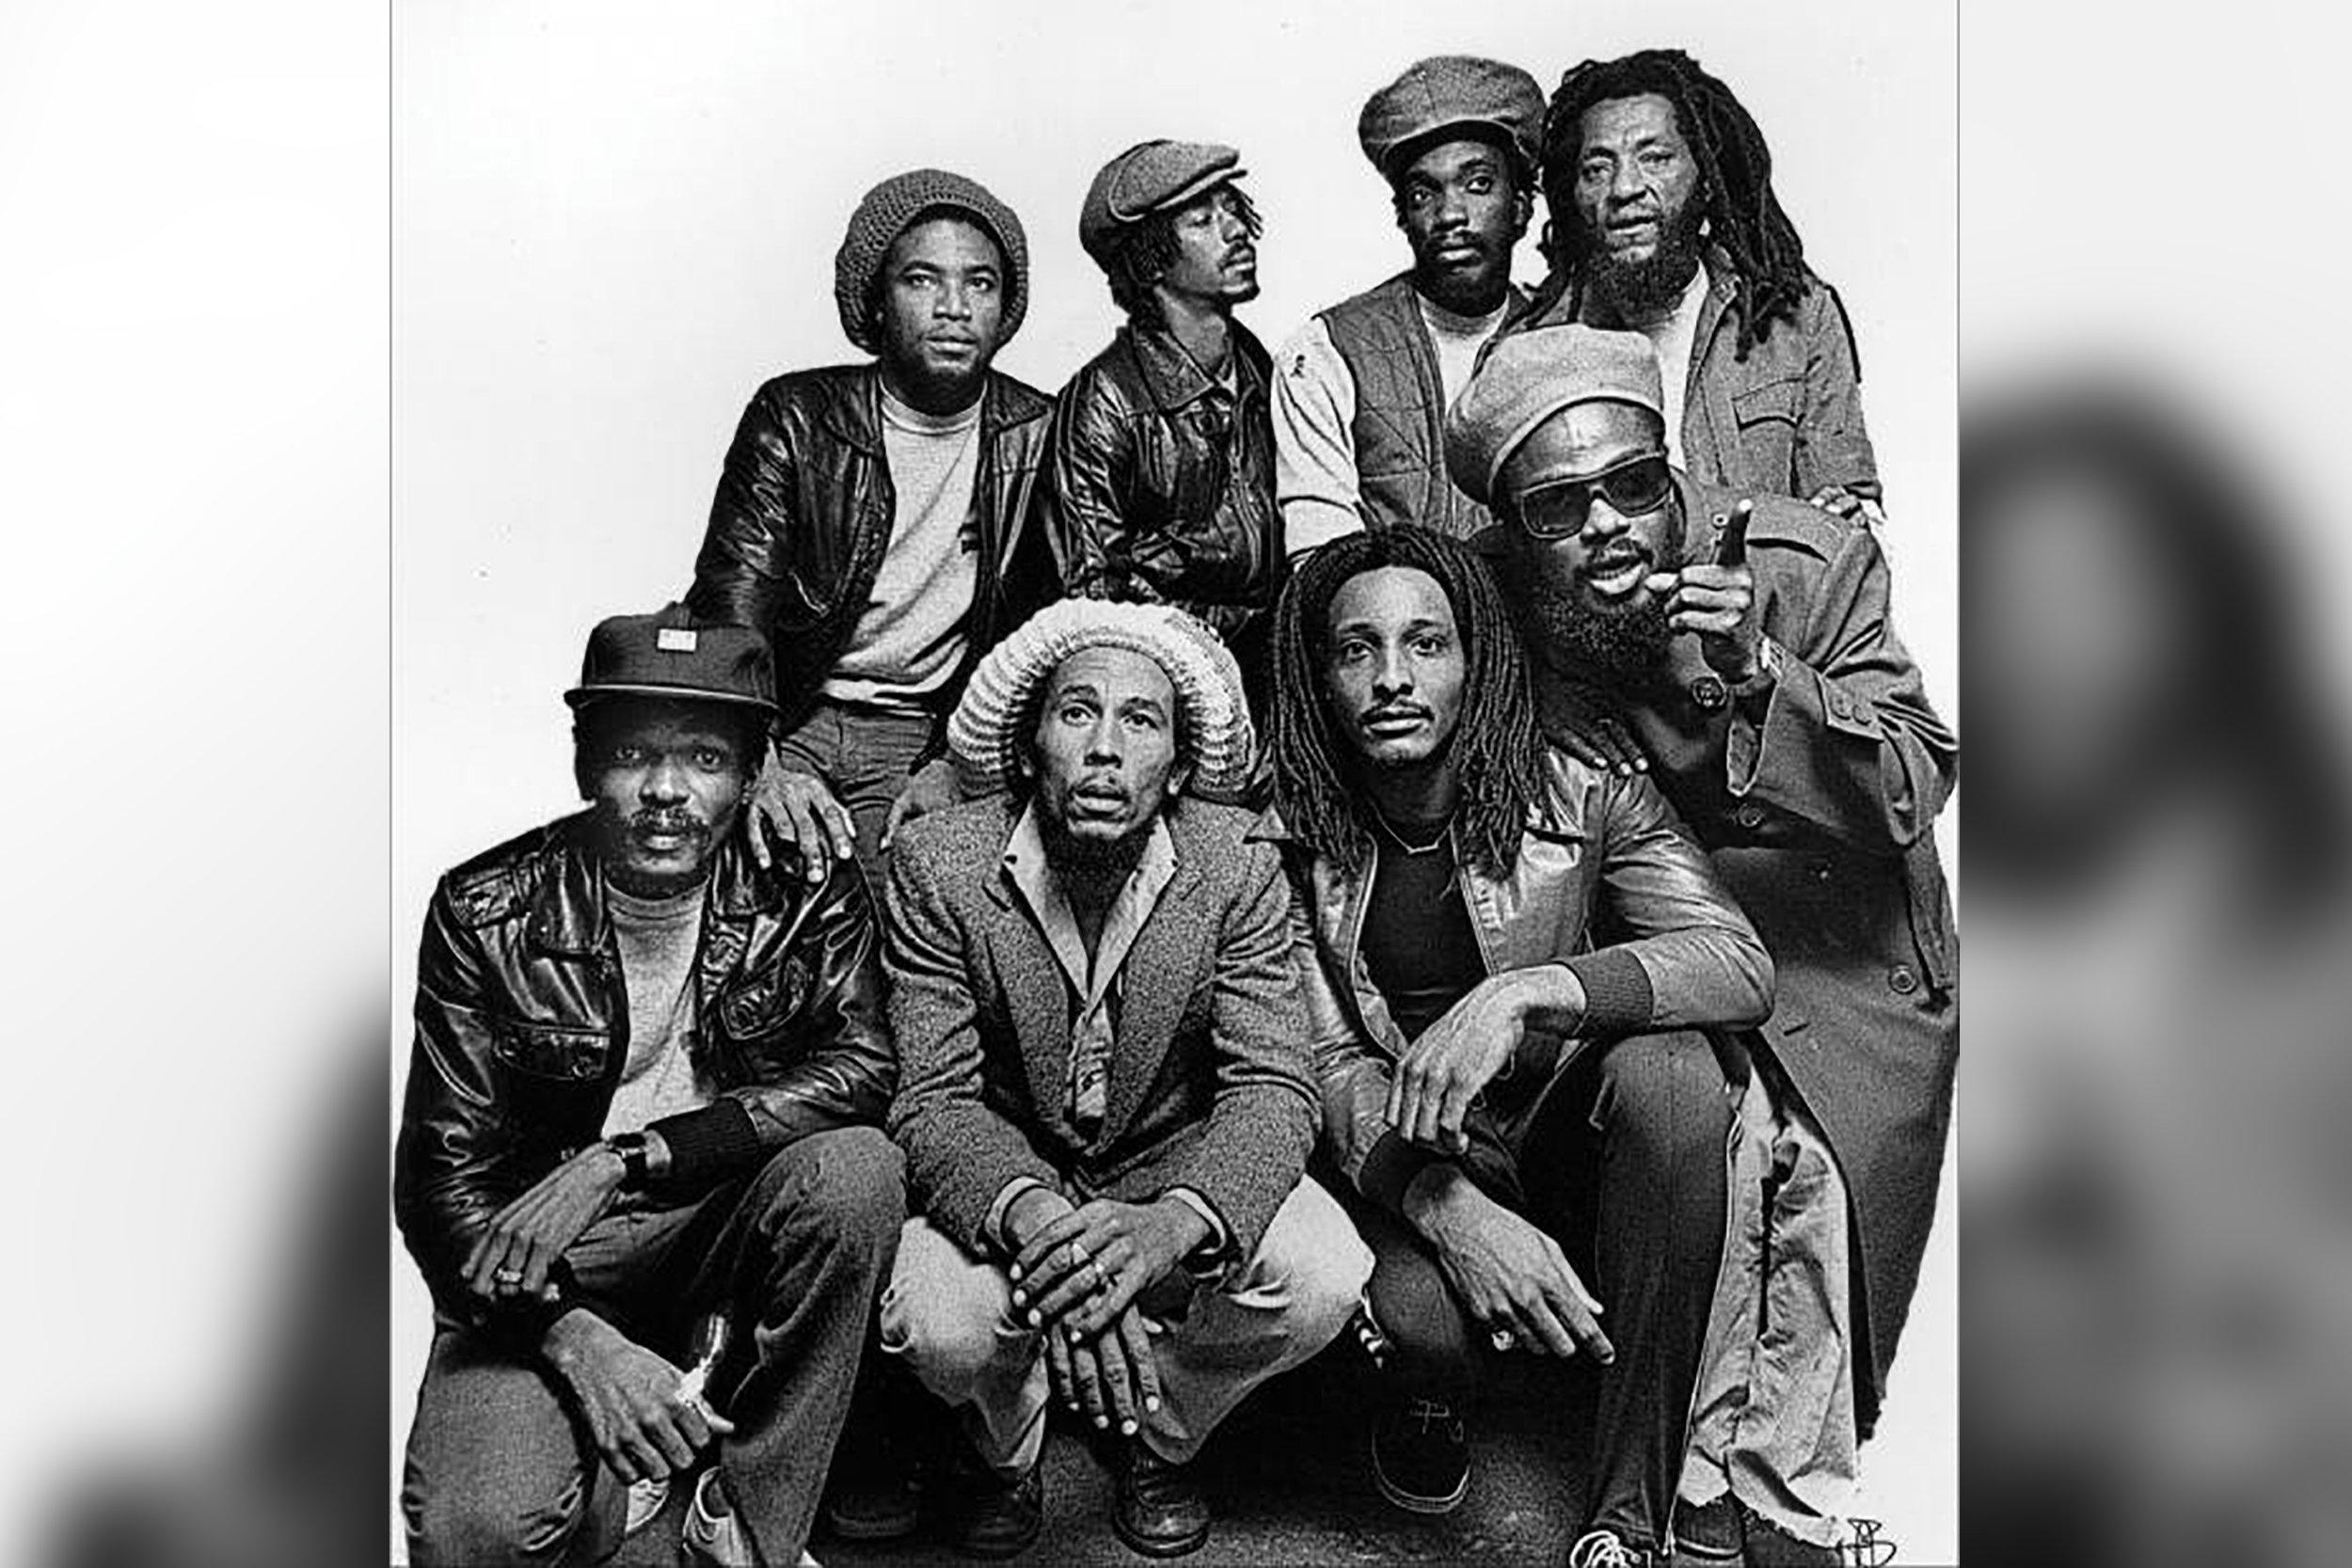 Bob Marley: The Origin Story Of Bob Marley And The Wailers